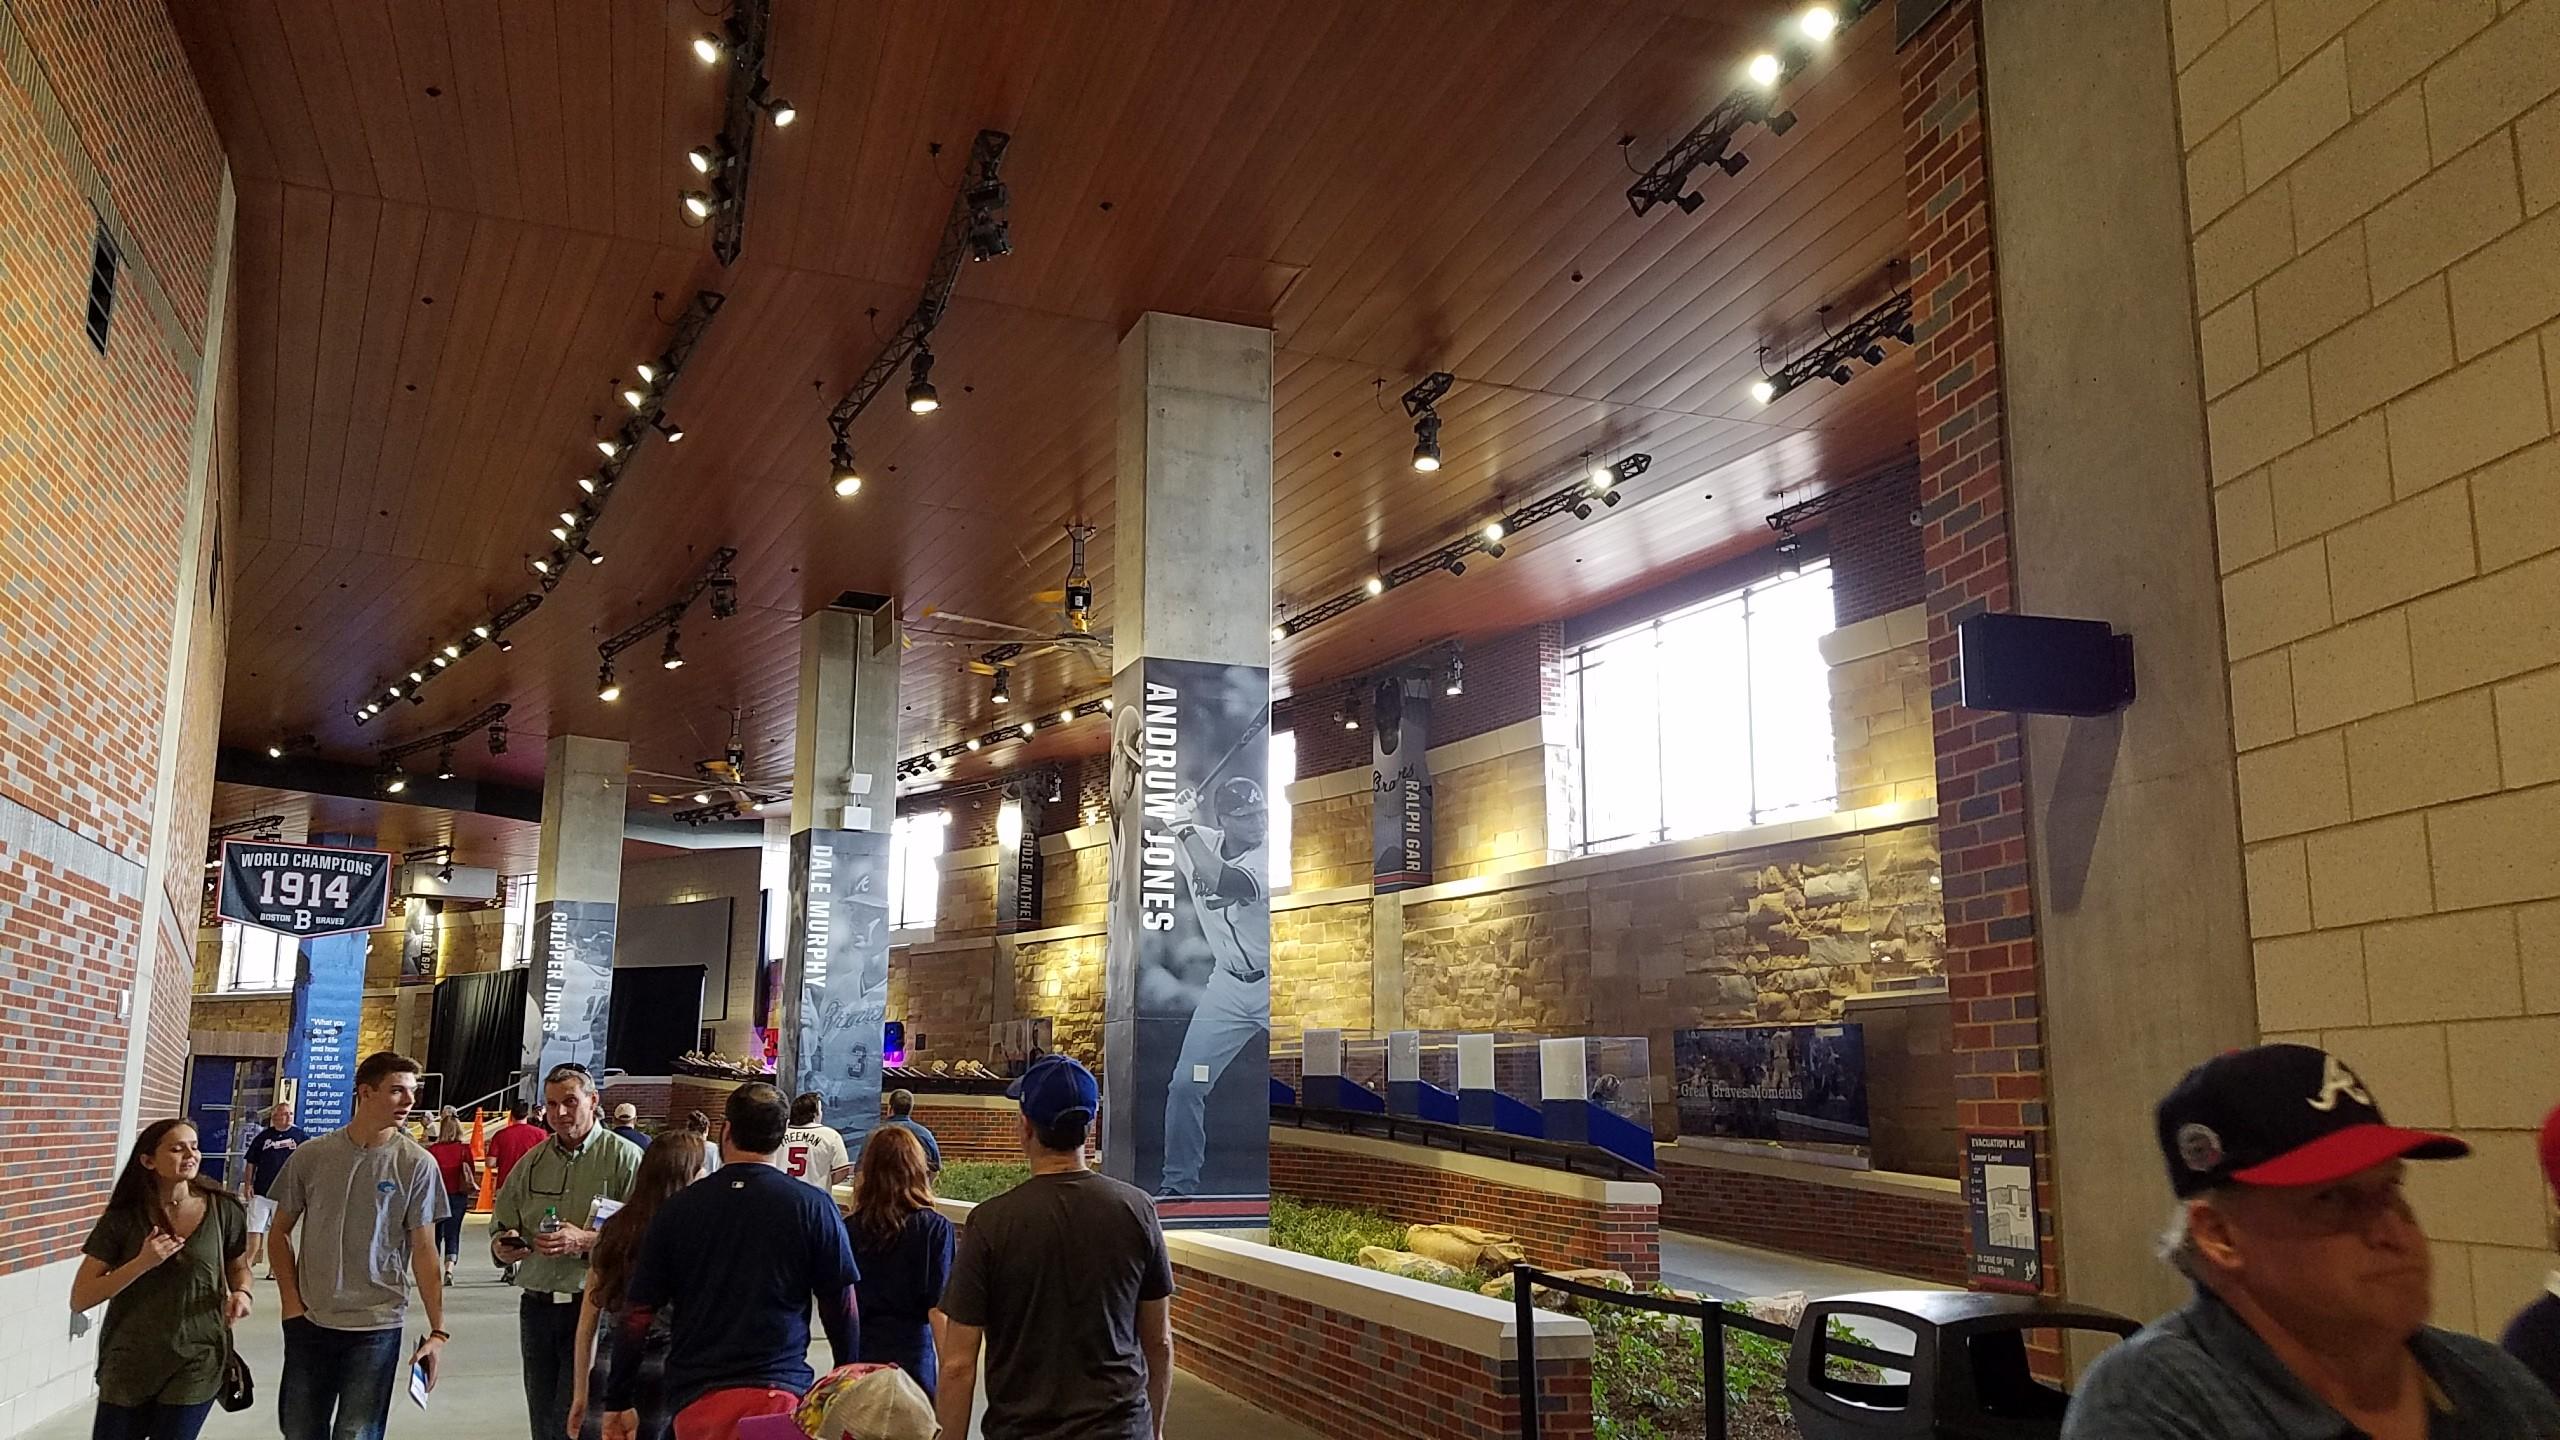 Braves Hall of Fame